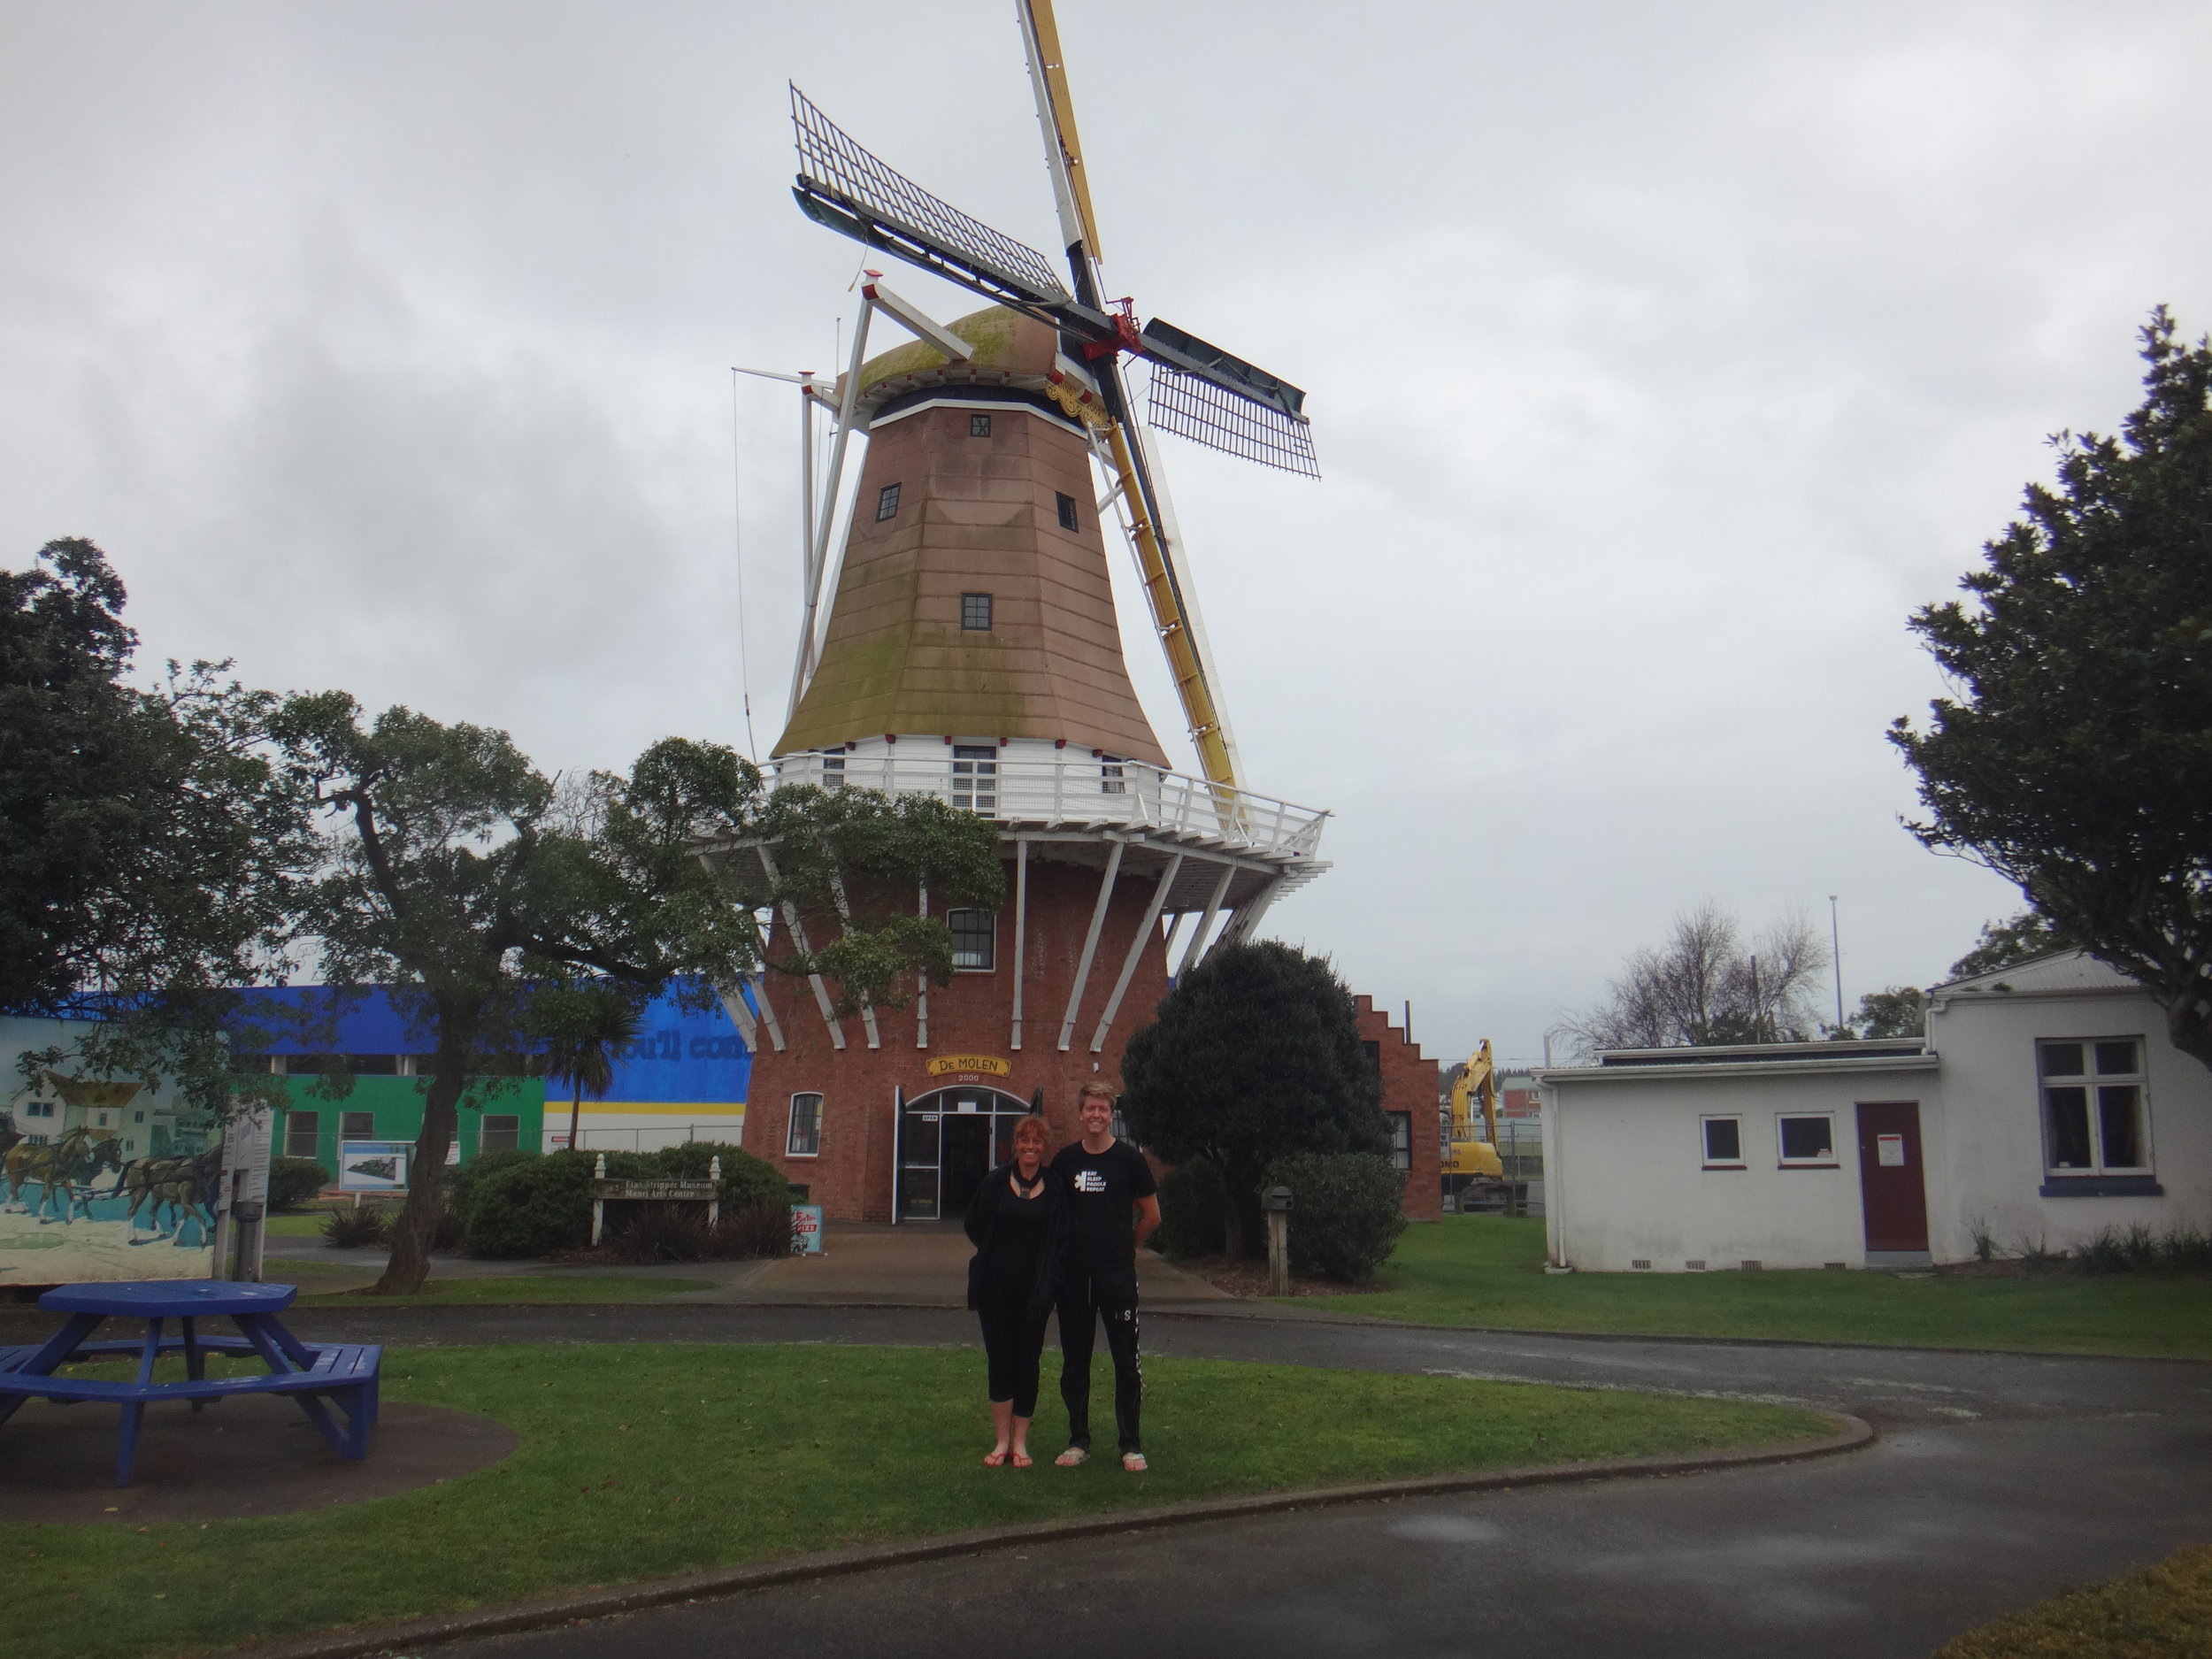 The Foxton windmill.